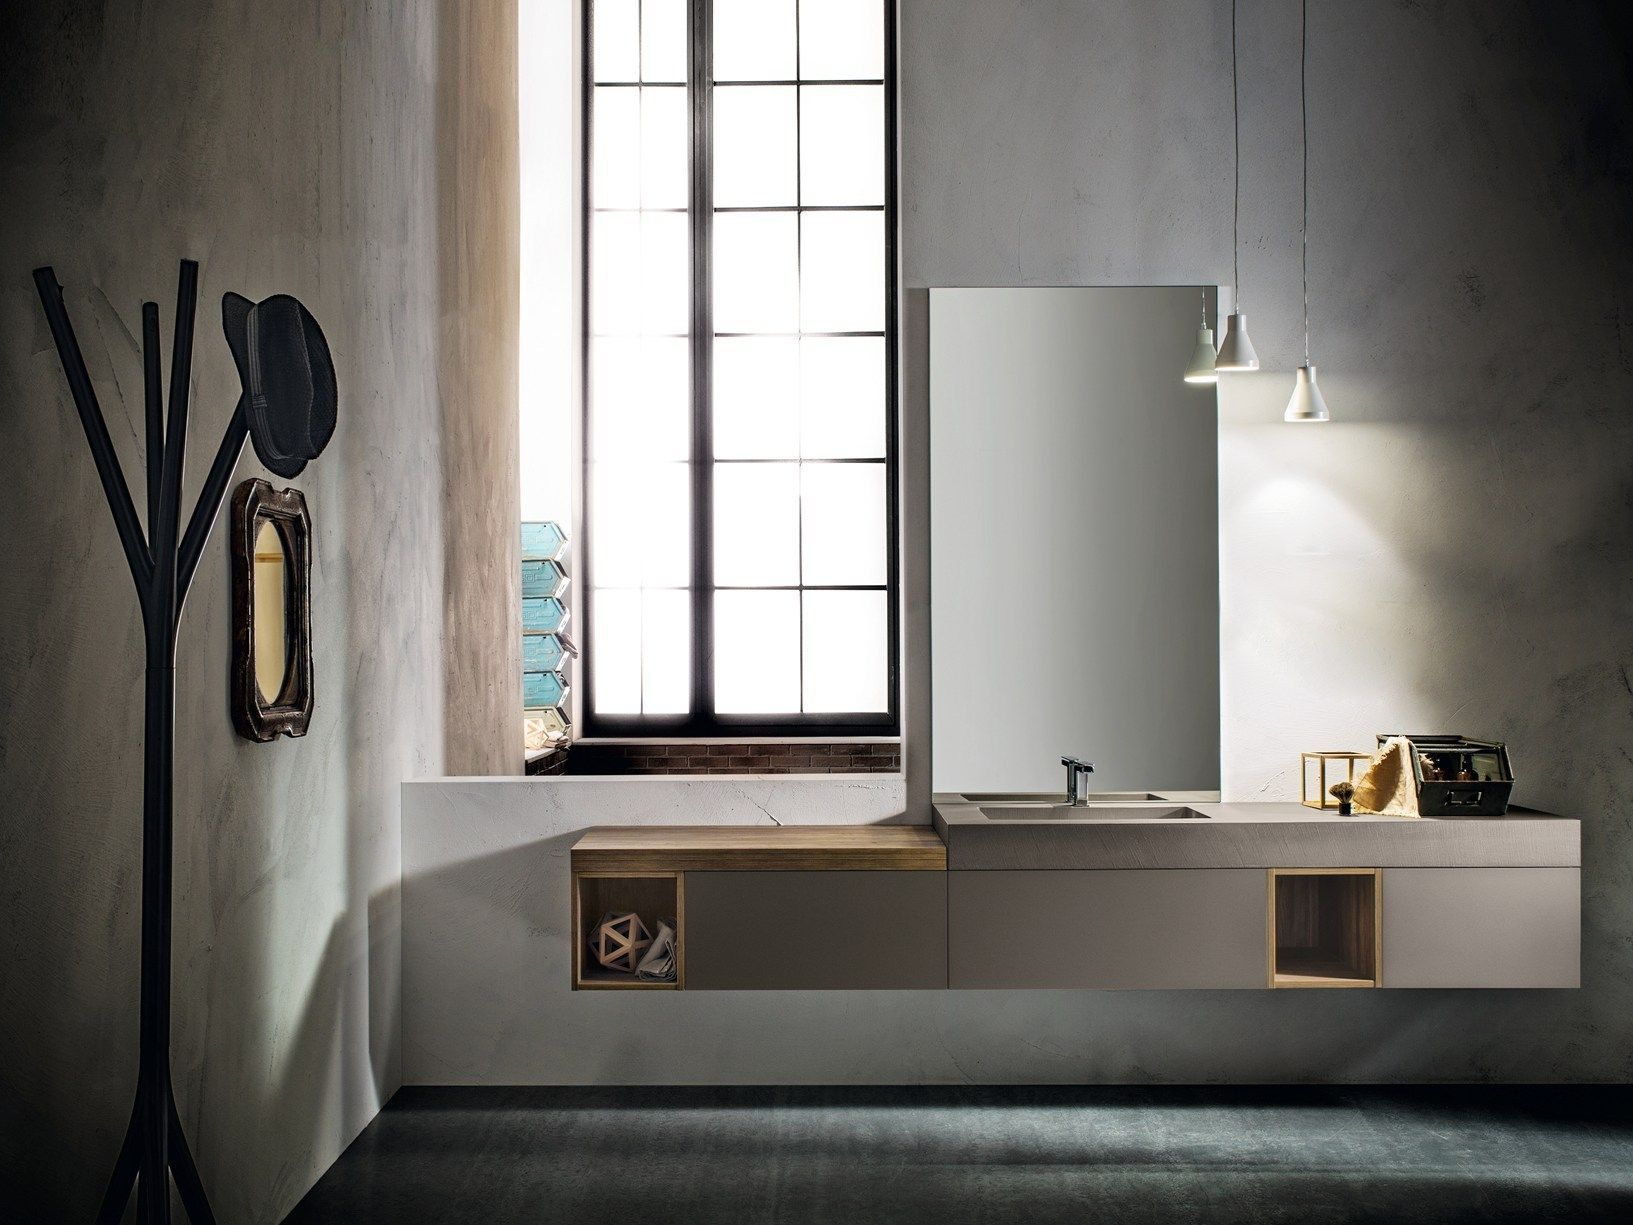 Bagno minimal o classico?